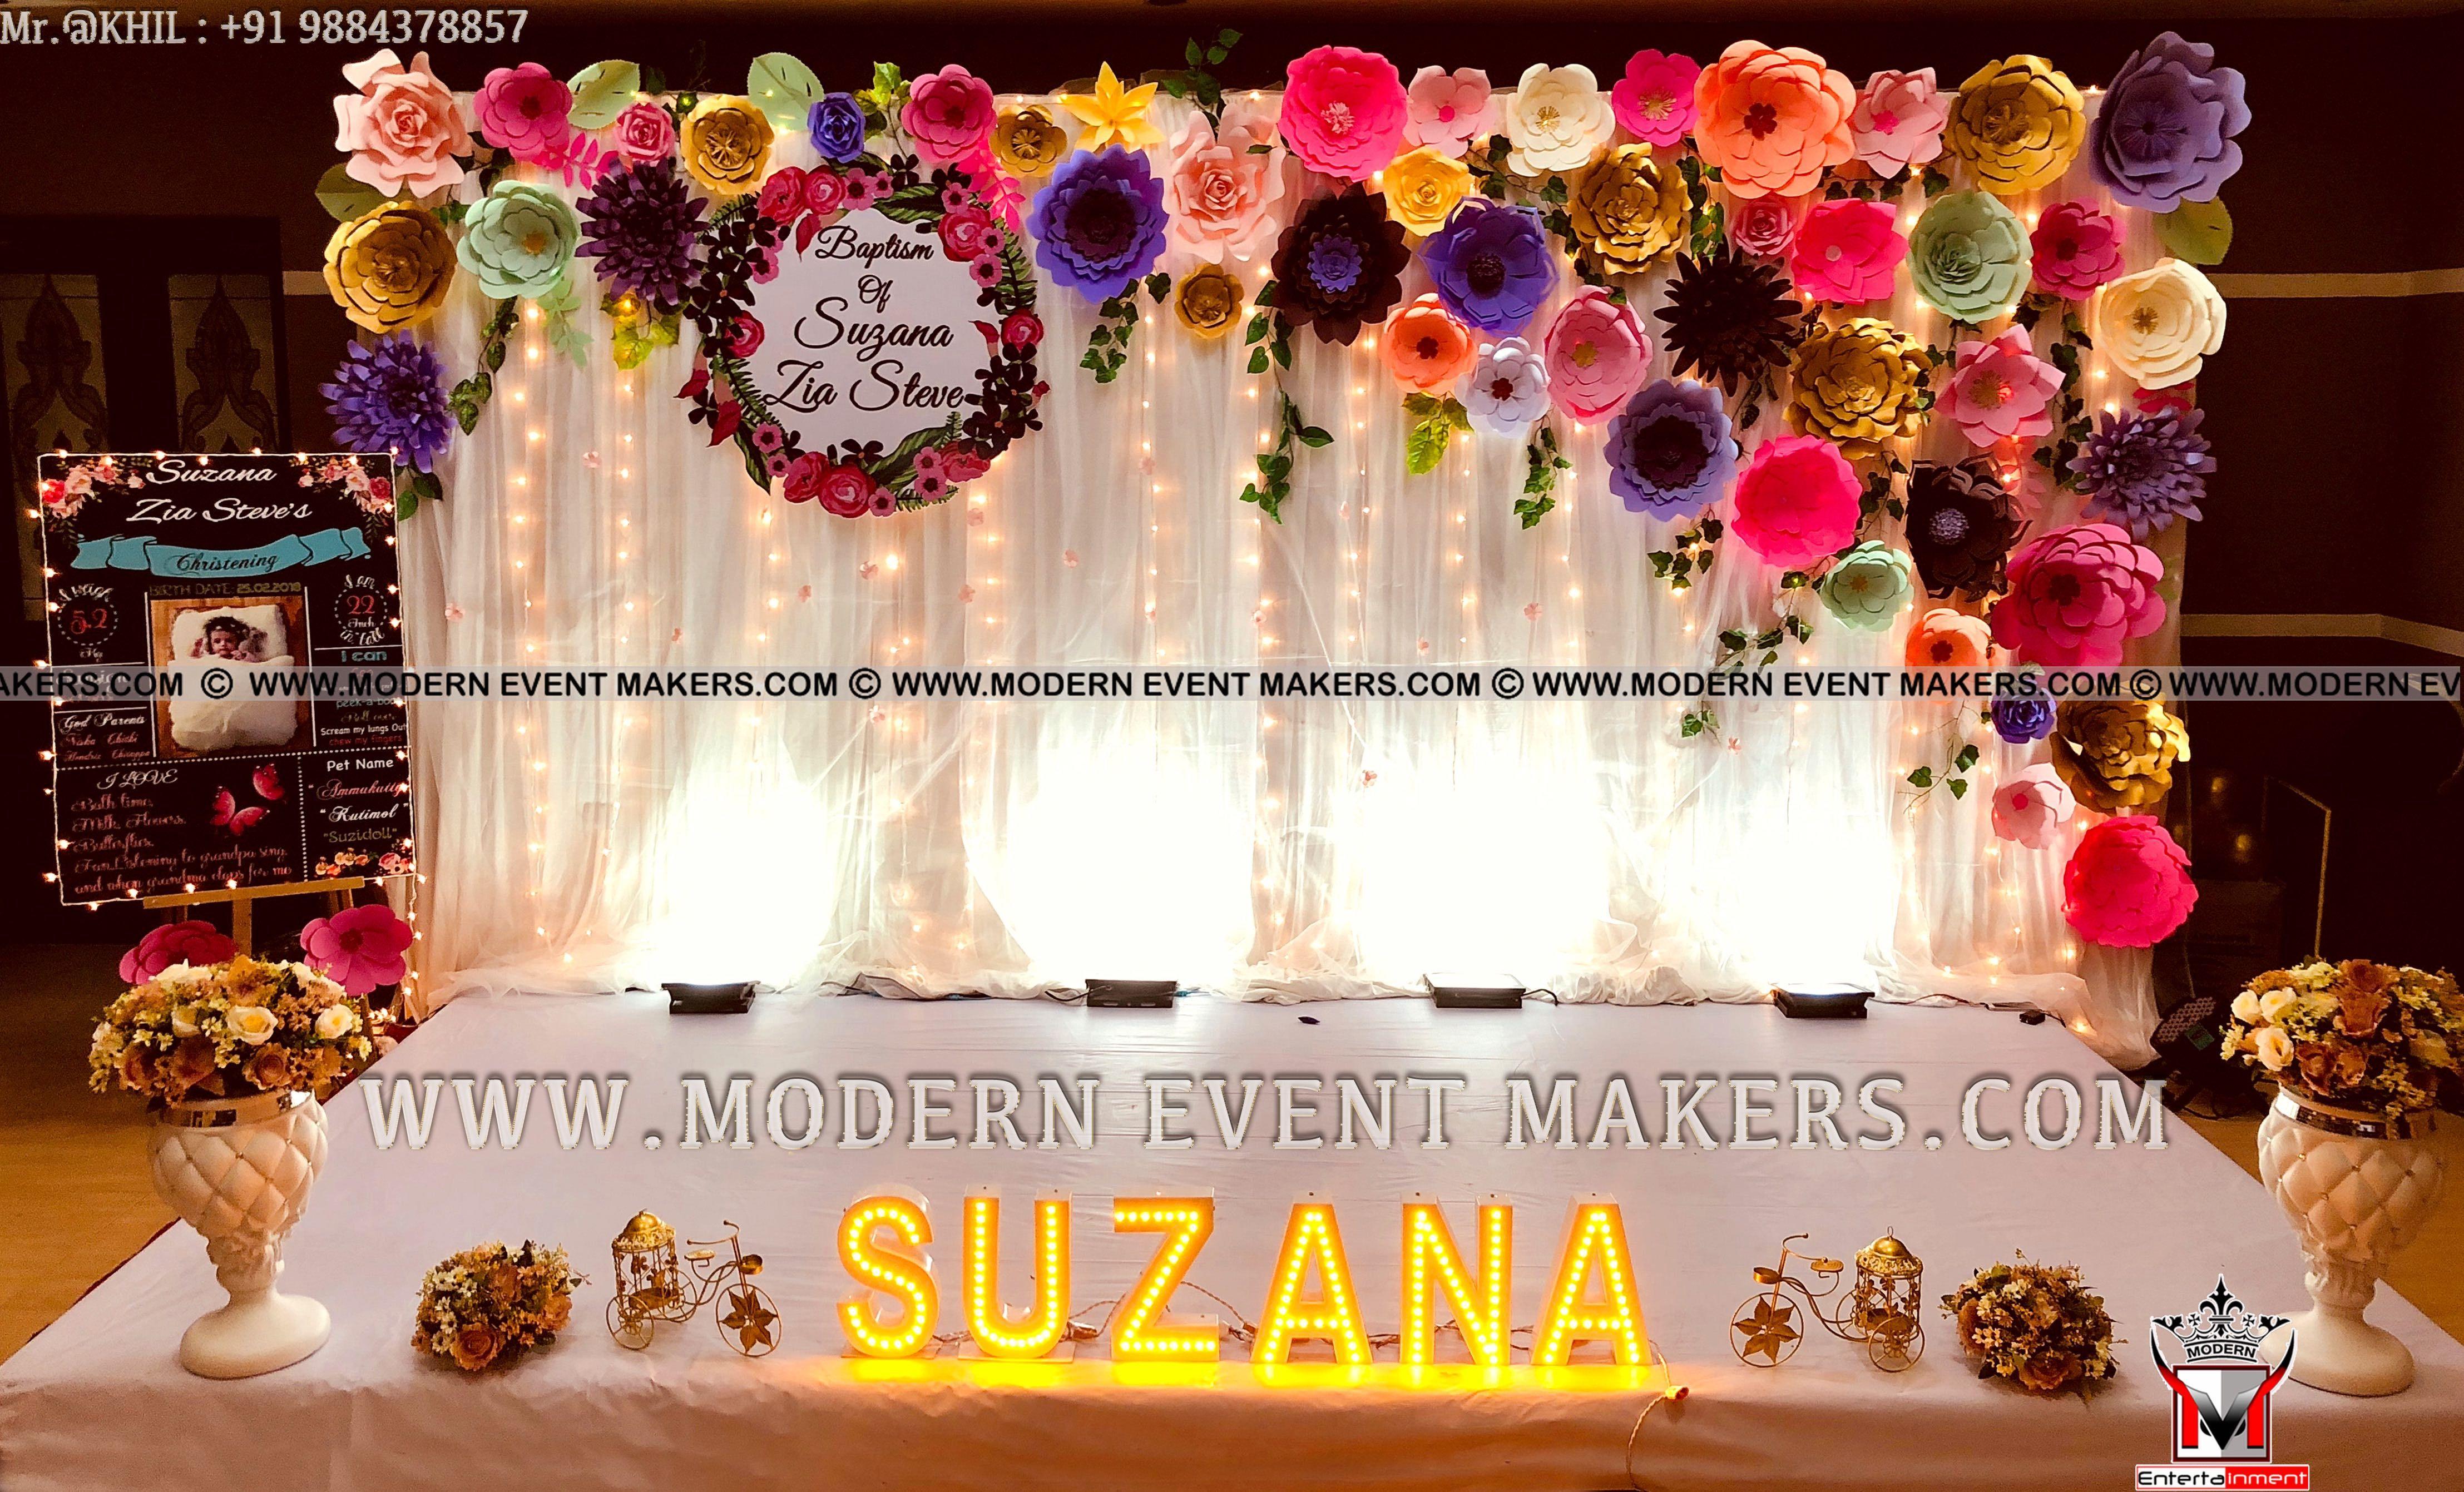 Vintage Floral Theme Decorators In Chennai 9884378857 Akhil7